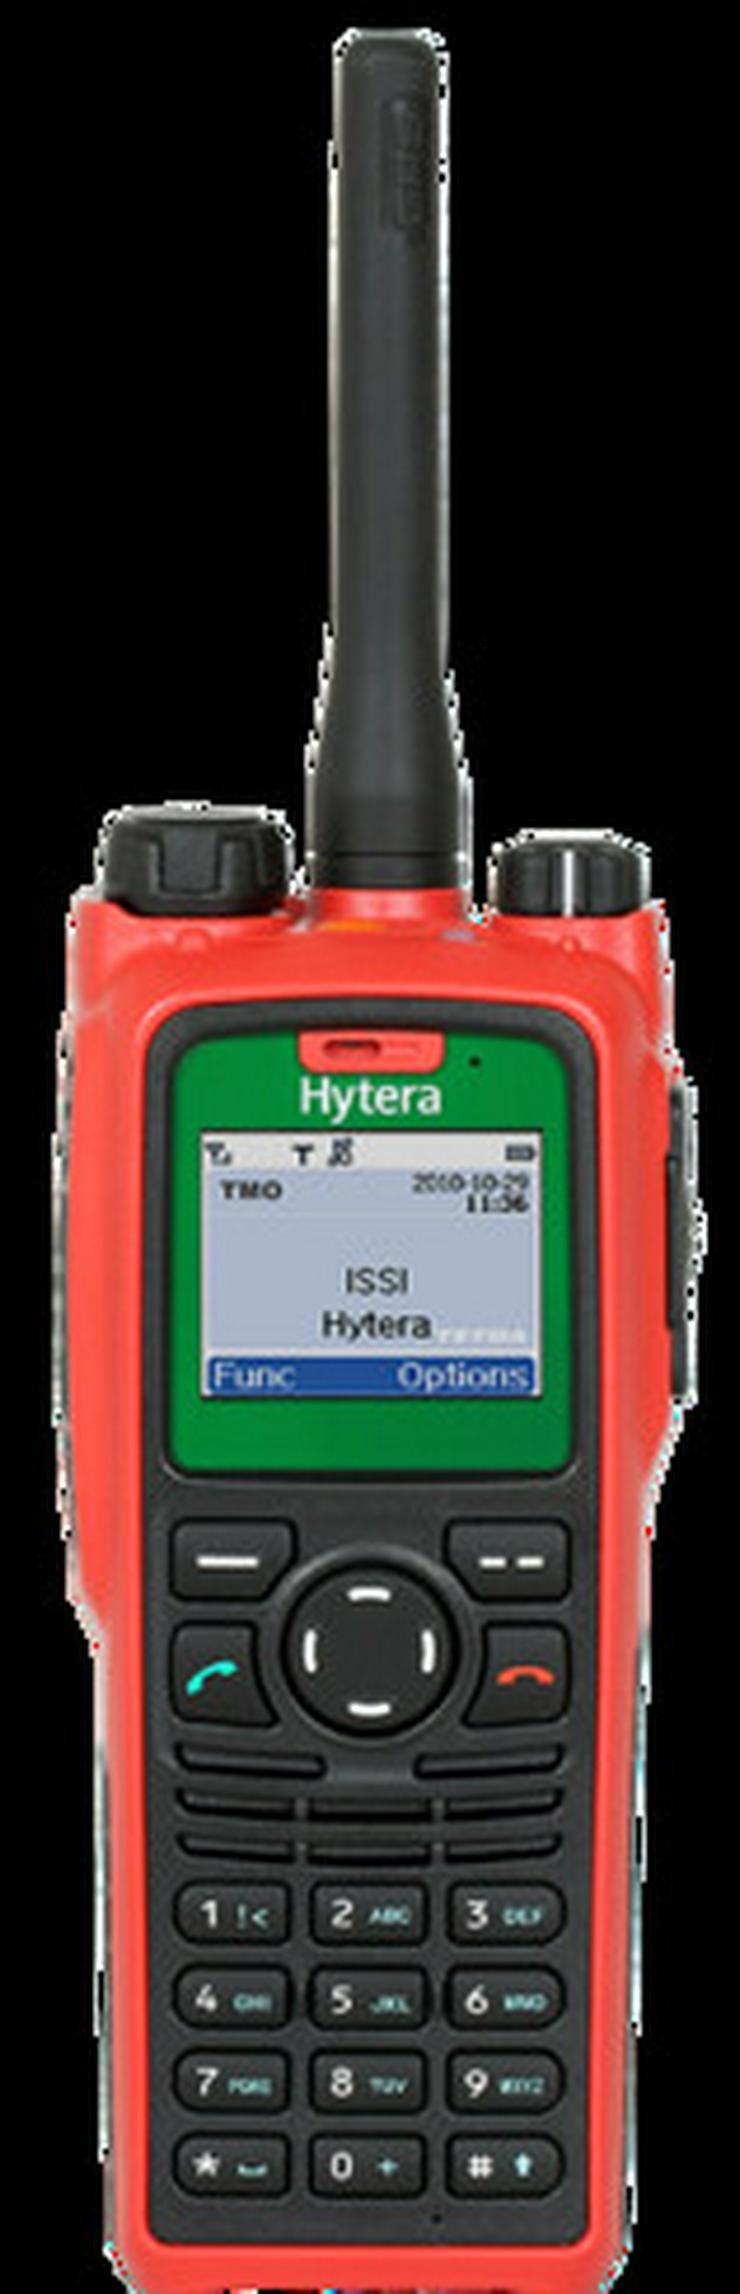 Bild 4: TC 620 Analoges hytera UHF Betriebsfunkgerät